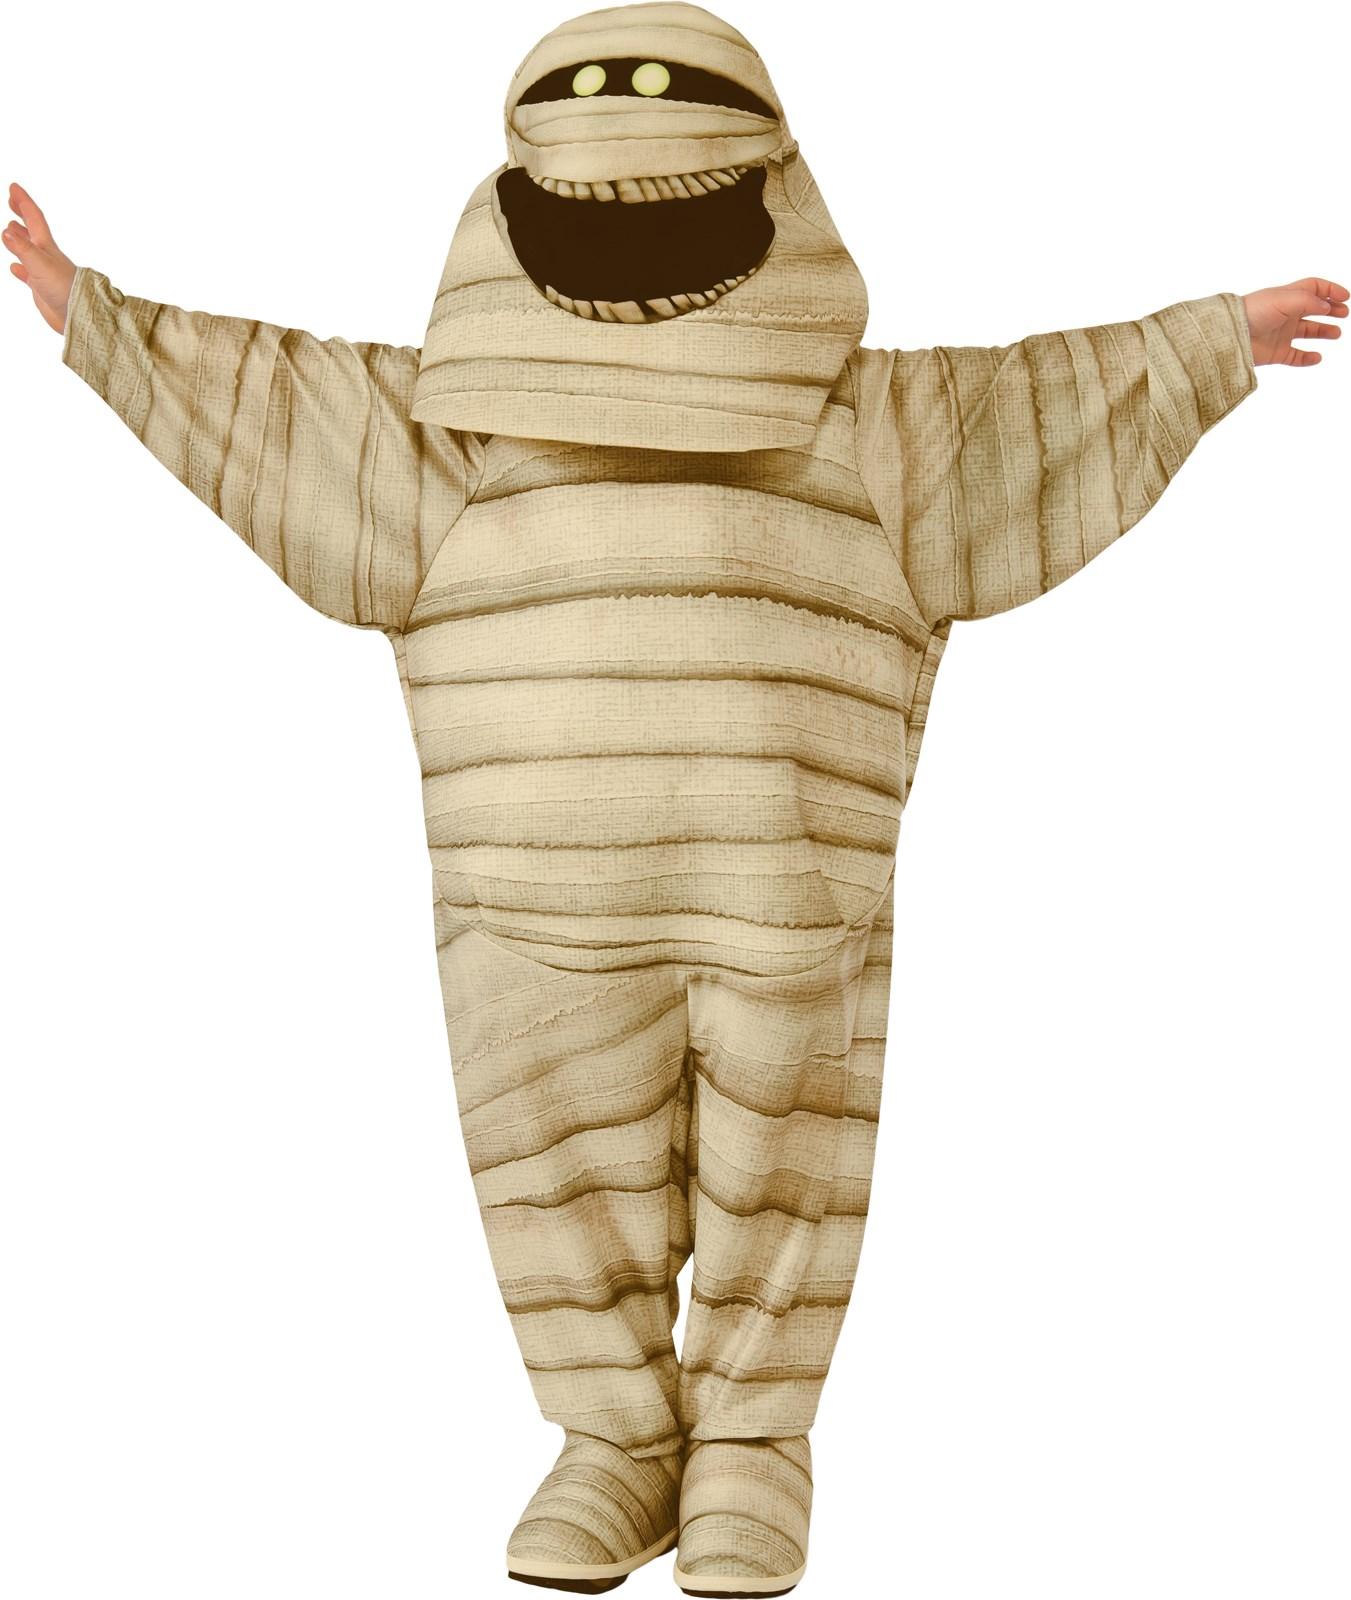 Hotel Transylvania 2: Mummy Costume For Kids